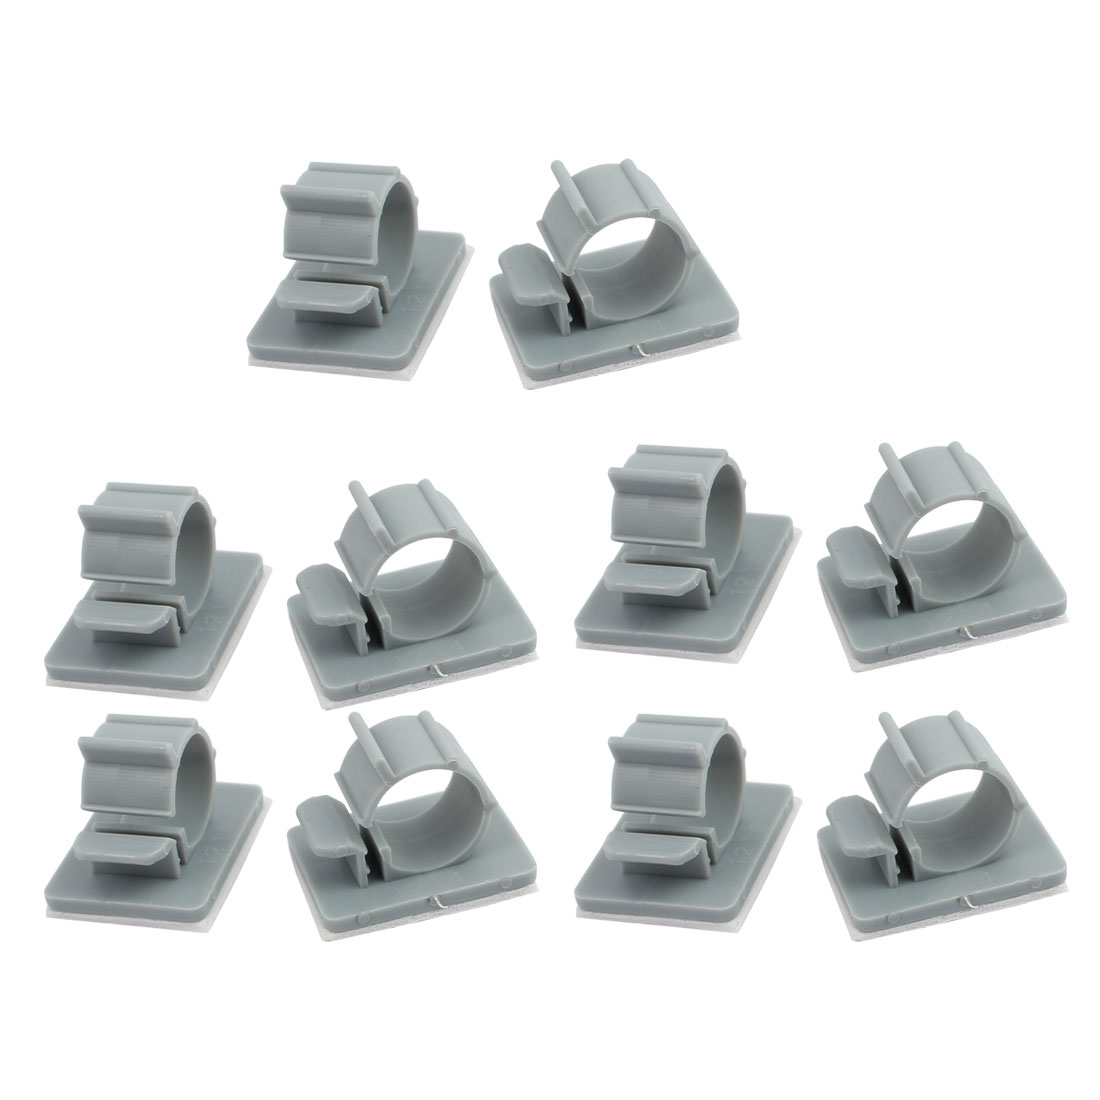 10Pcs TS-1214 Self Adhesive Adjustable Cable Tie Sticker Clip Diameter 14mm Gray